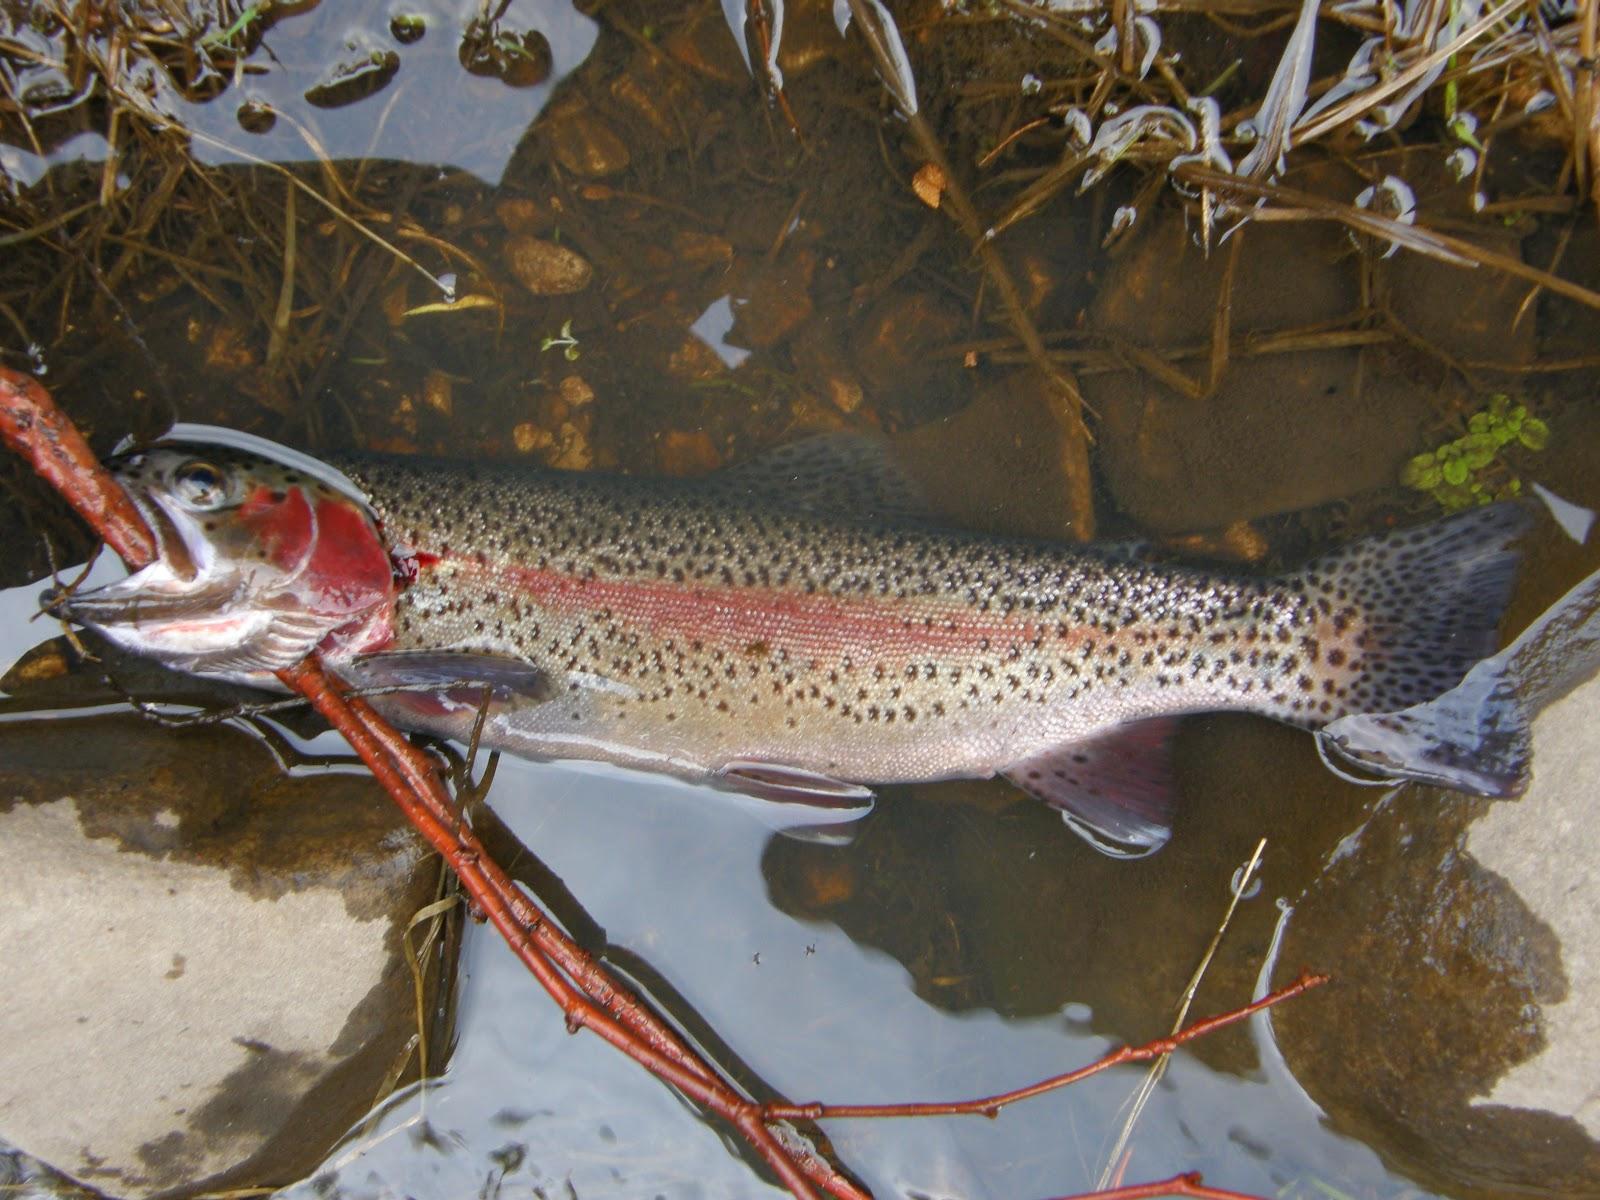 Oak creek angler april 2012 for Clear creek fishing